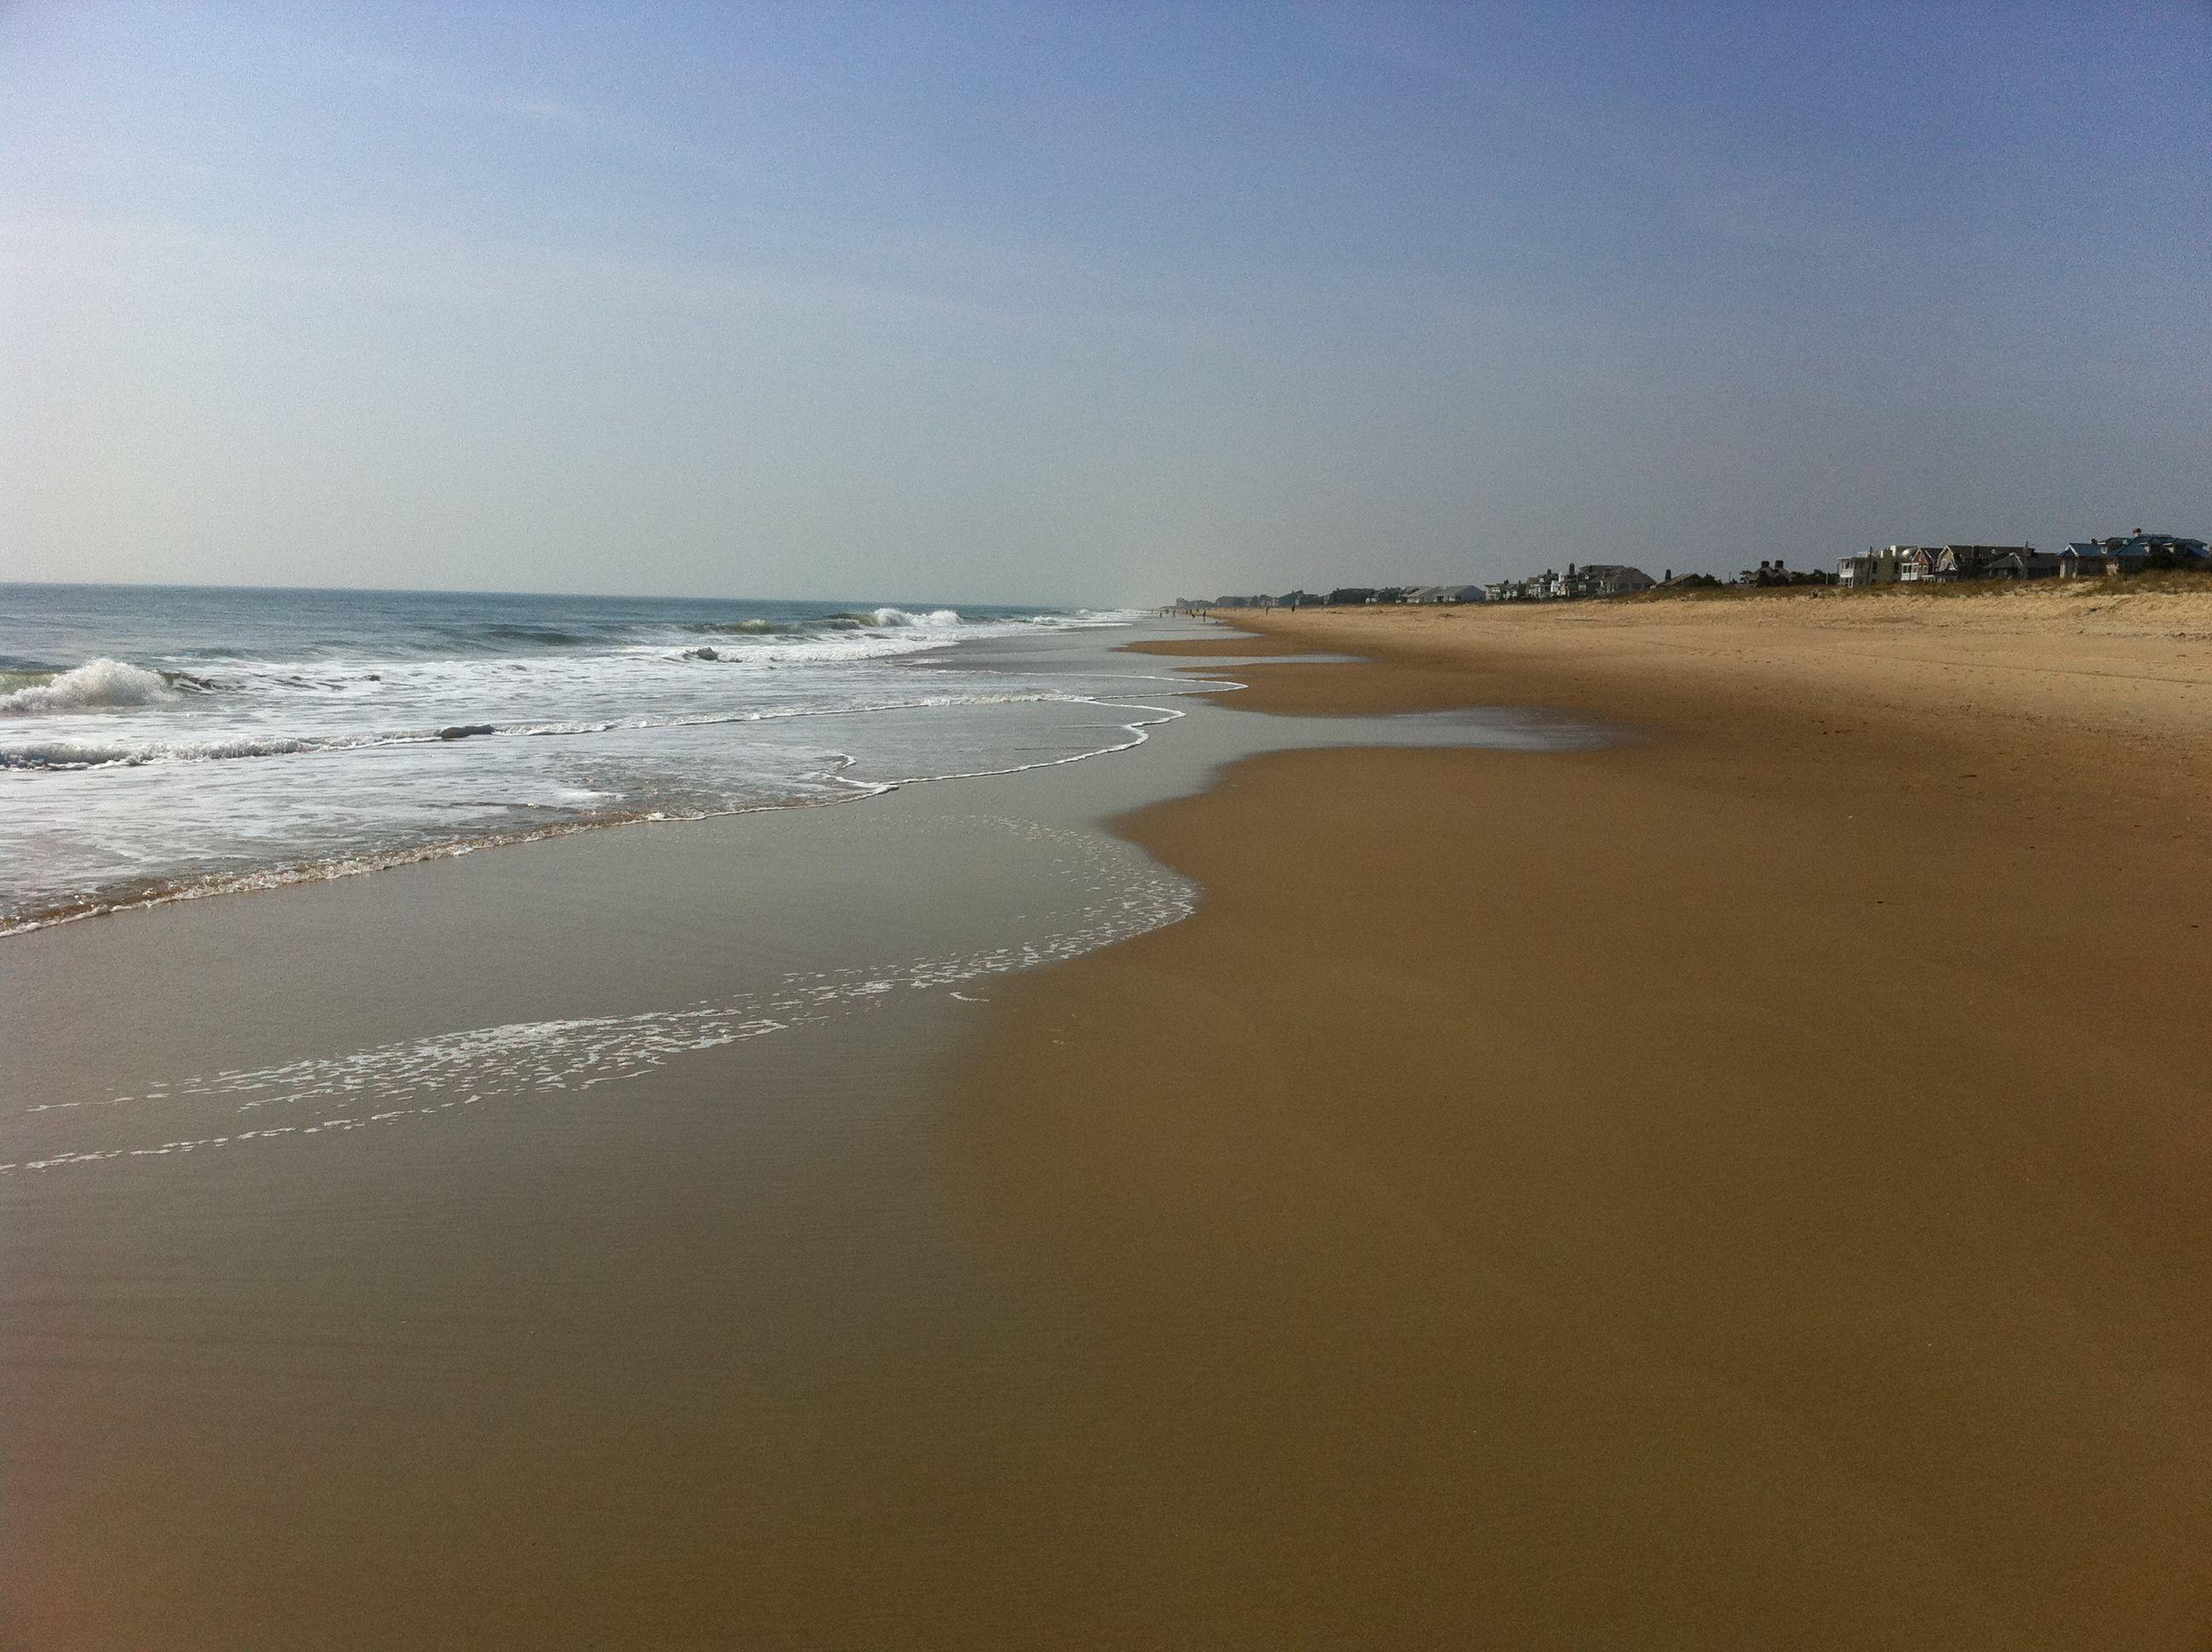 Rehoboth Beach - Peaceful Off Season Solitude - Sent in by Rob Mandelberg - Rehoboth Beach